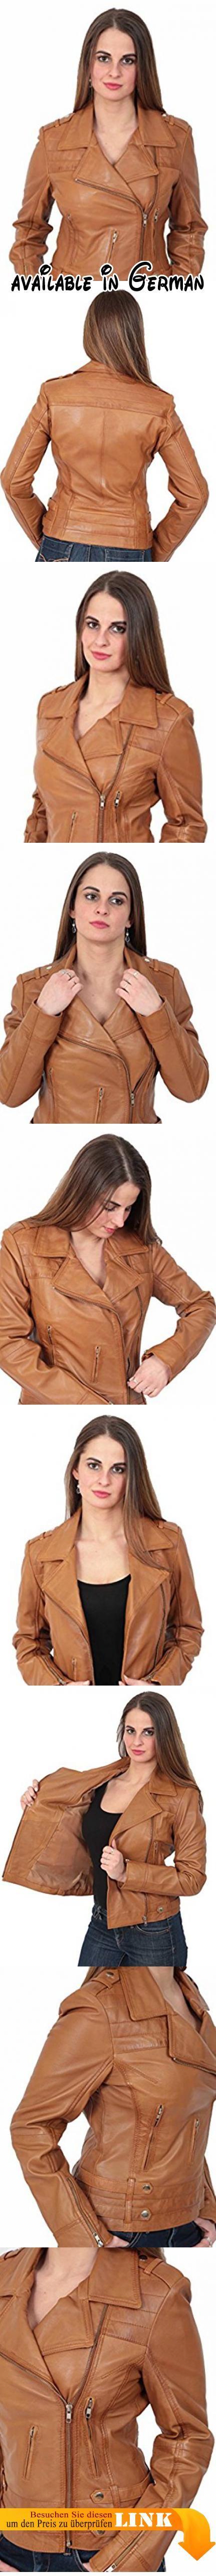 Neueste Young Damen Fitted Leder Leder Biker X-Zip Mode Jacke Beverly  Hellbraun (XL - EU 42). Beliebte Damen Biker Jacke, aus weichem  italienischem… 2855aecd53